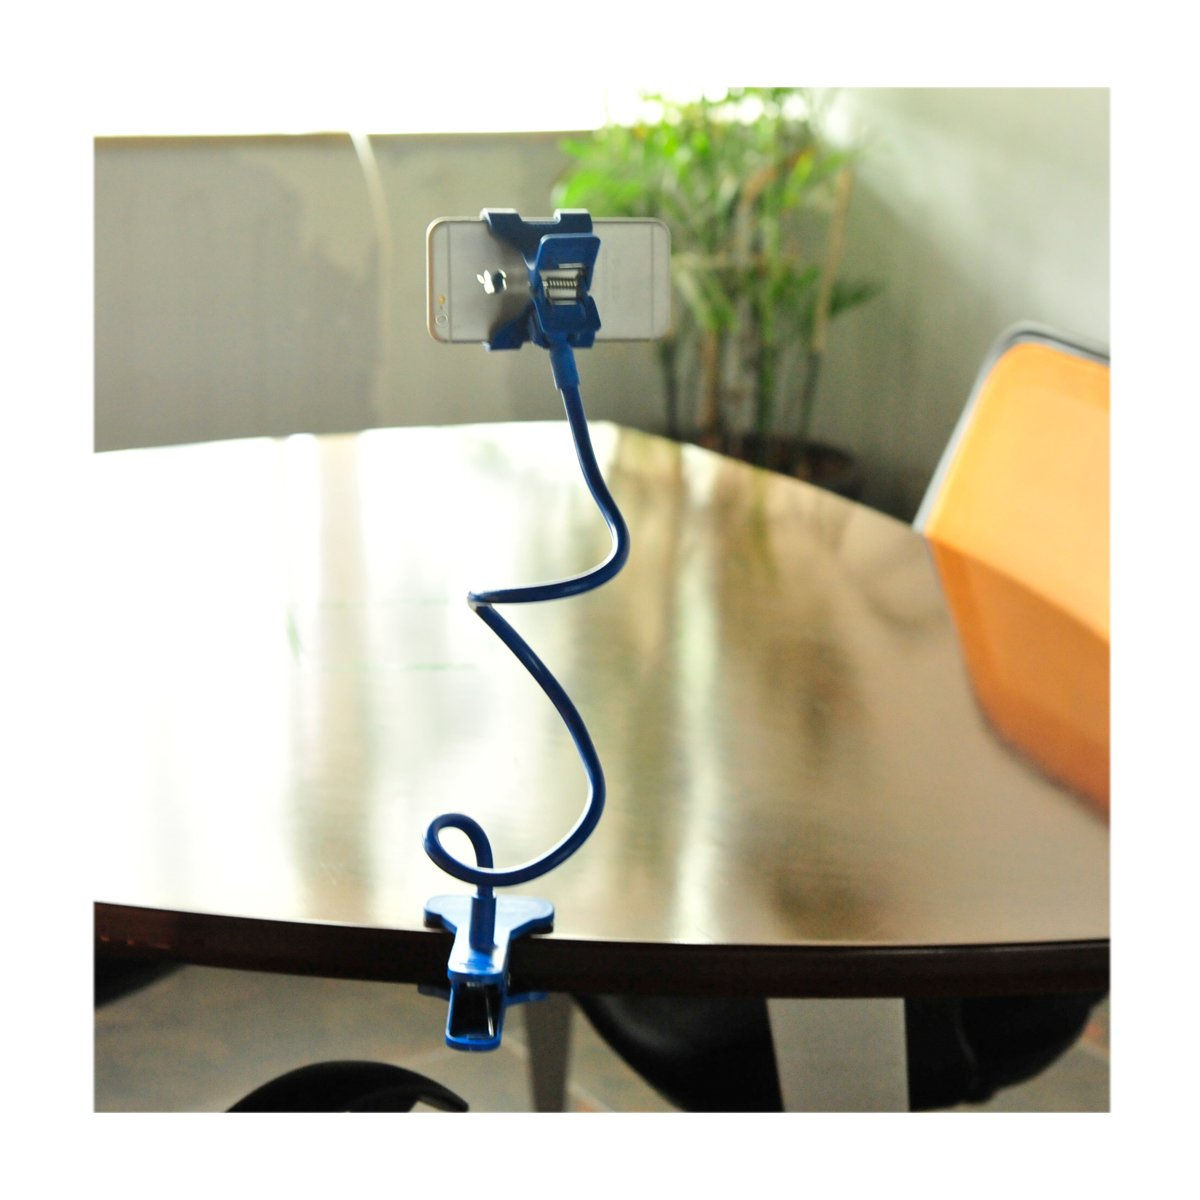 Buy Flexible Phone Holder For Bedroom Long Neck Cell Phone